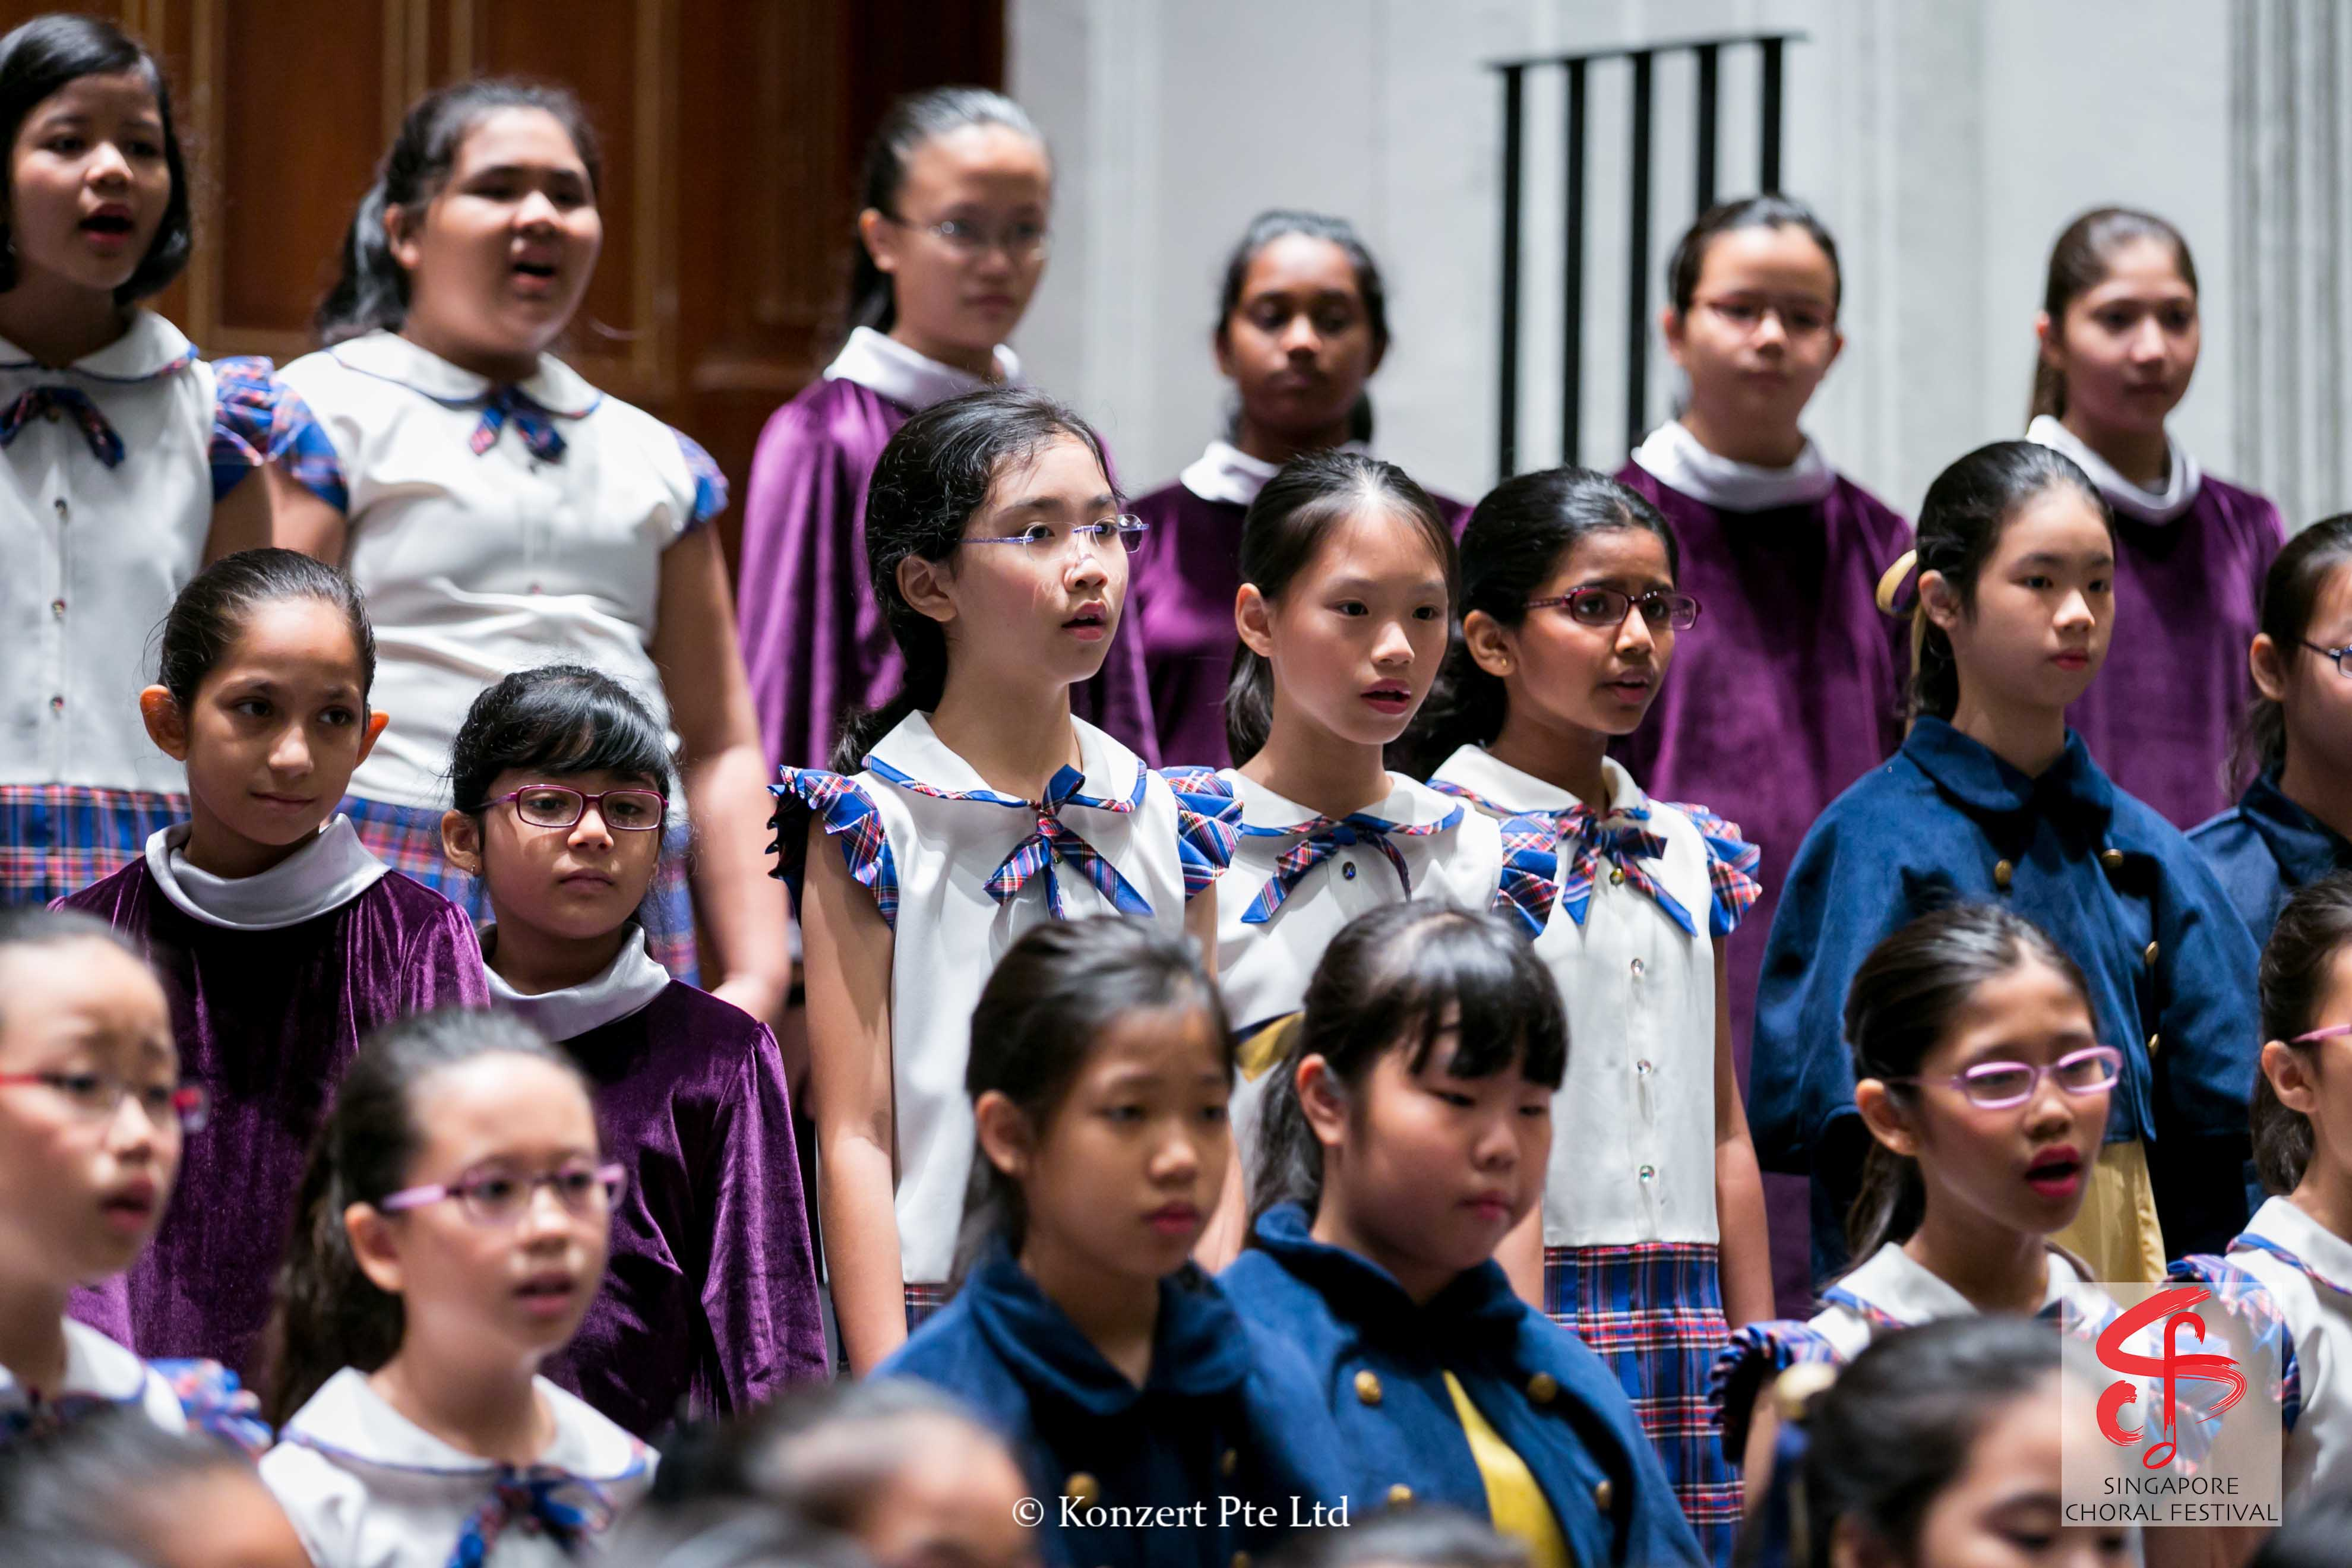 Singapore Choral Festival 8-8-15 (5).jpg